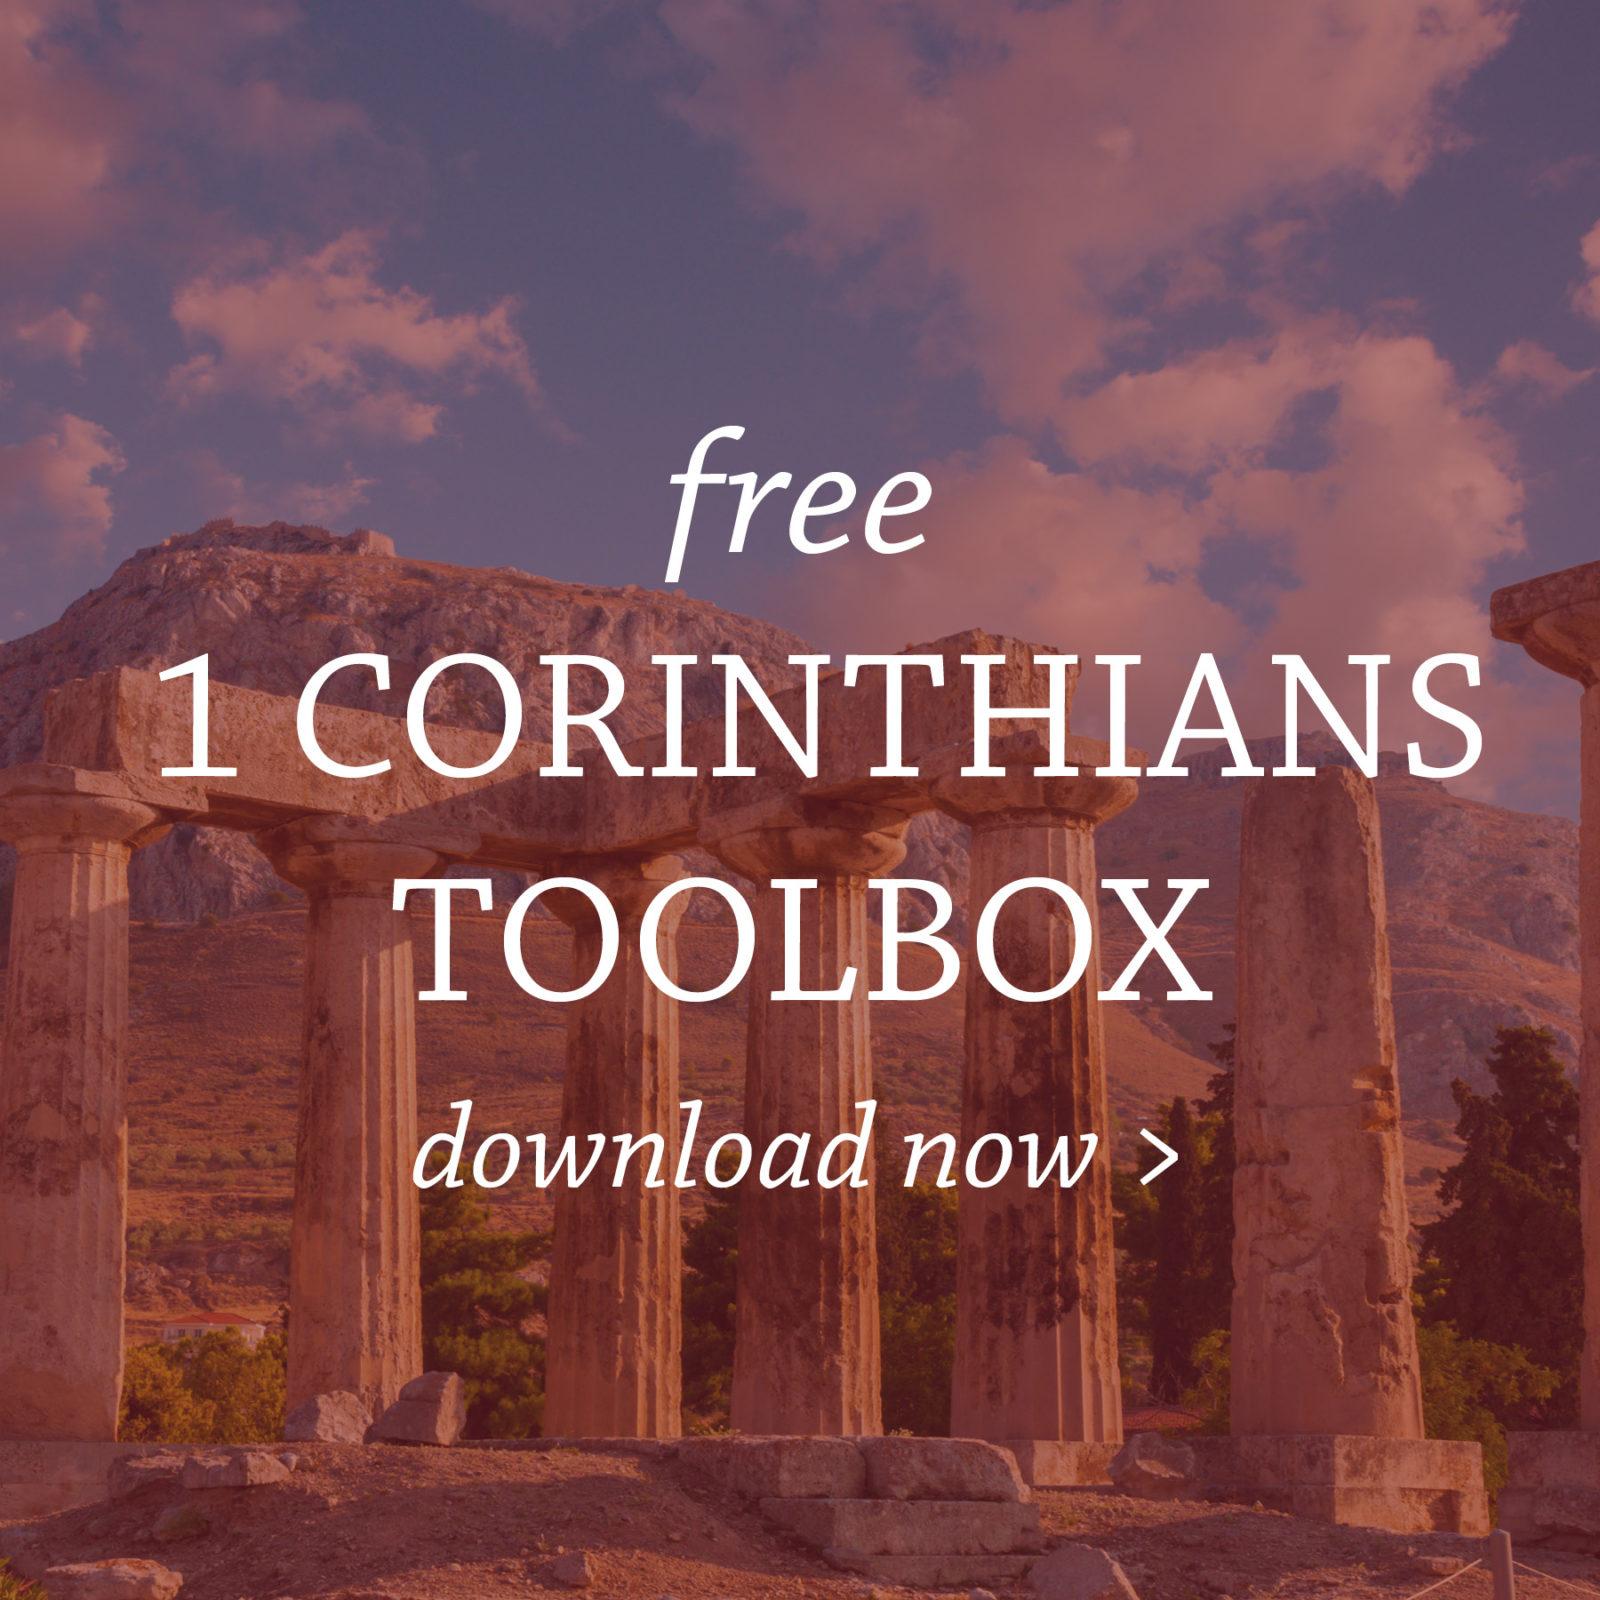 Free 1 Corinthians Tool Box Download